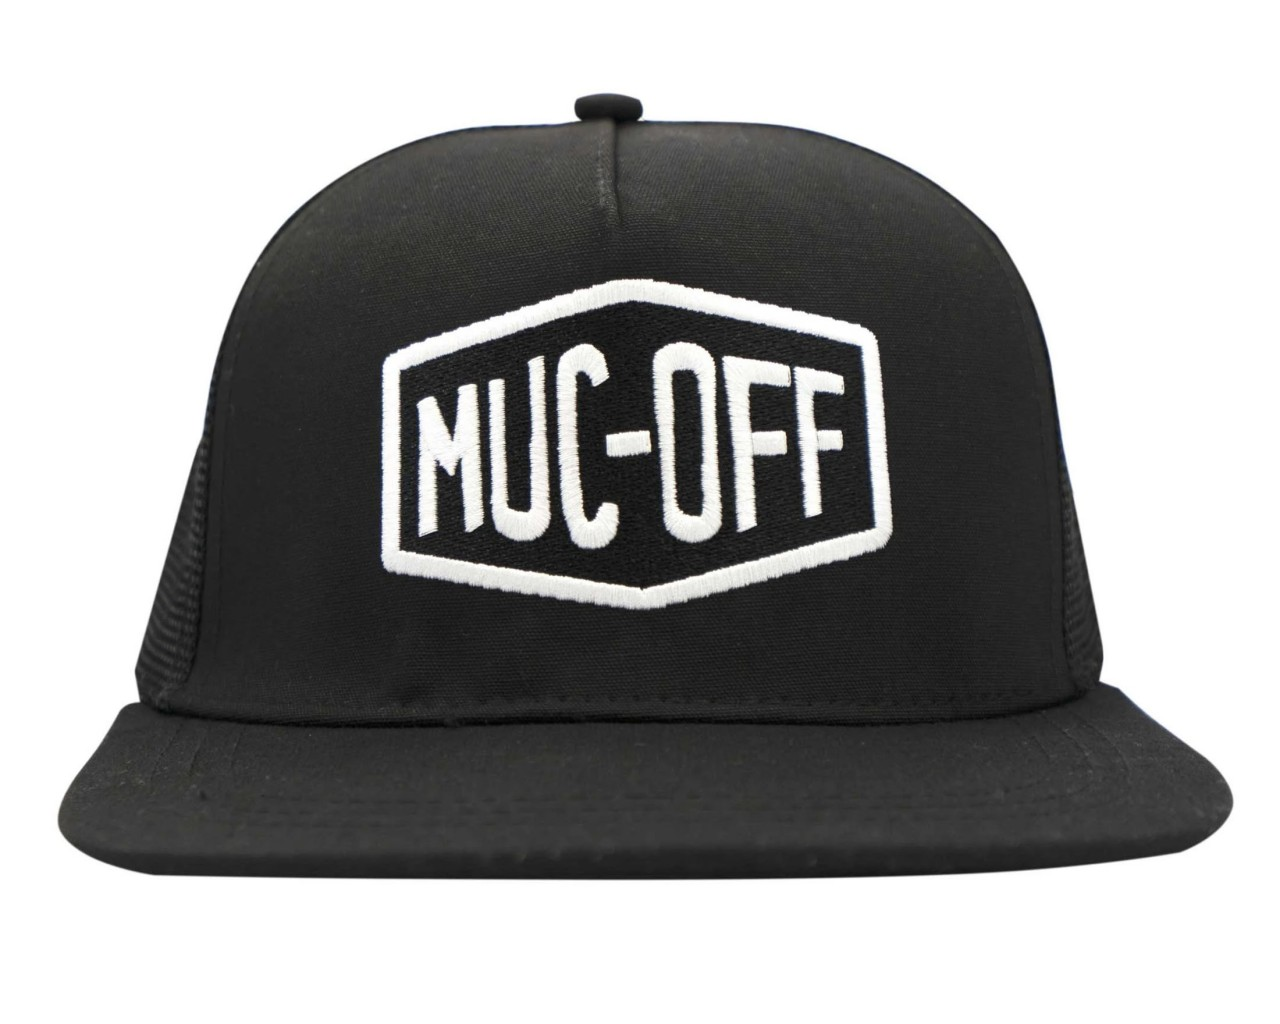 Muc-Off Works Mesh Back Trucker Cap | black